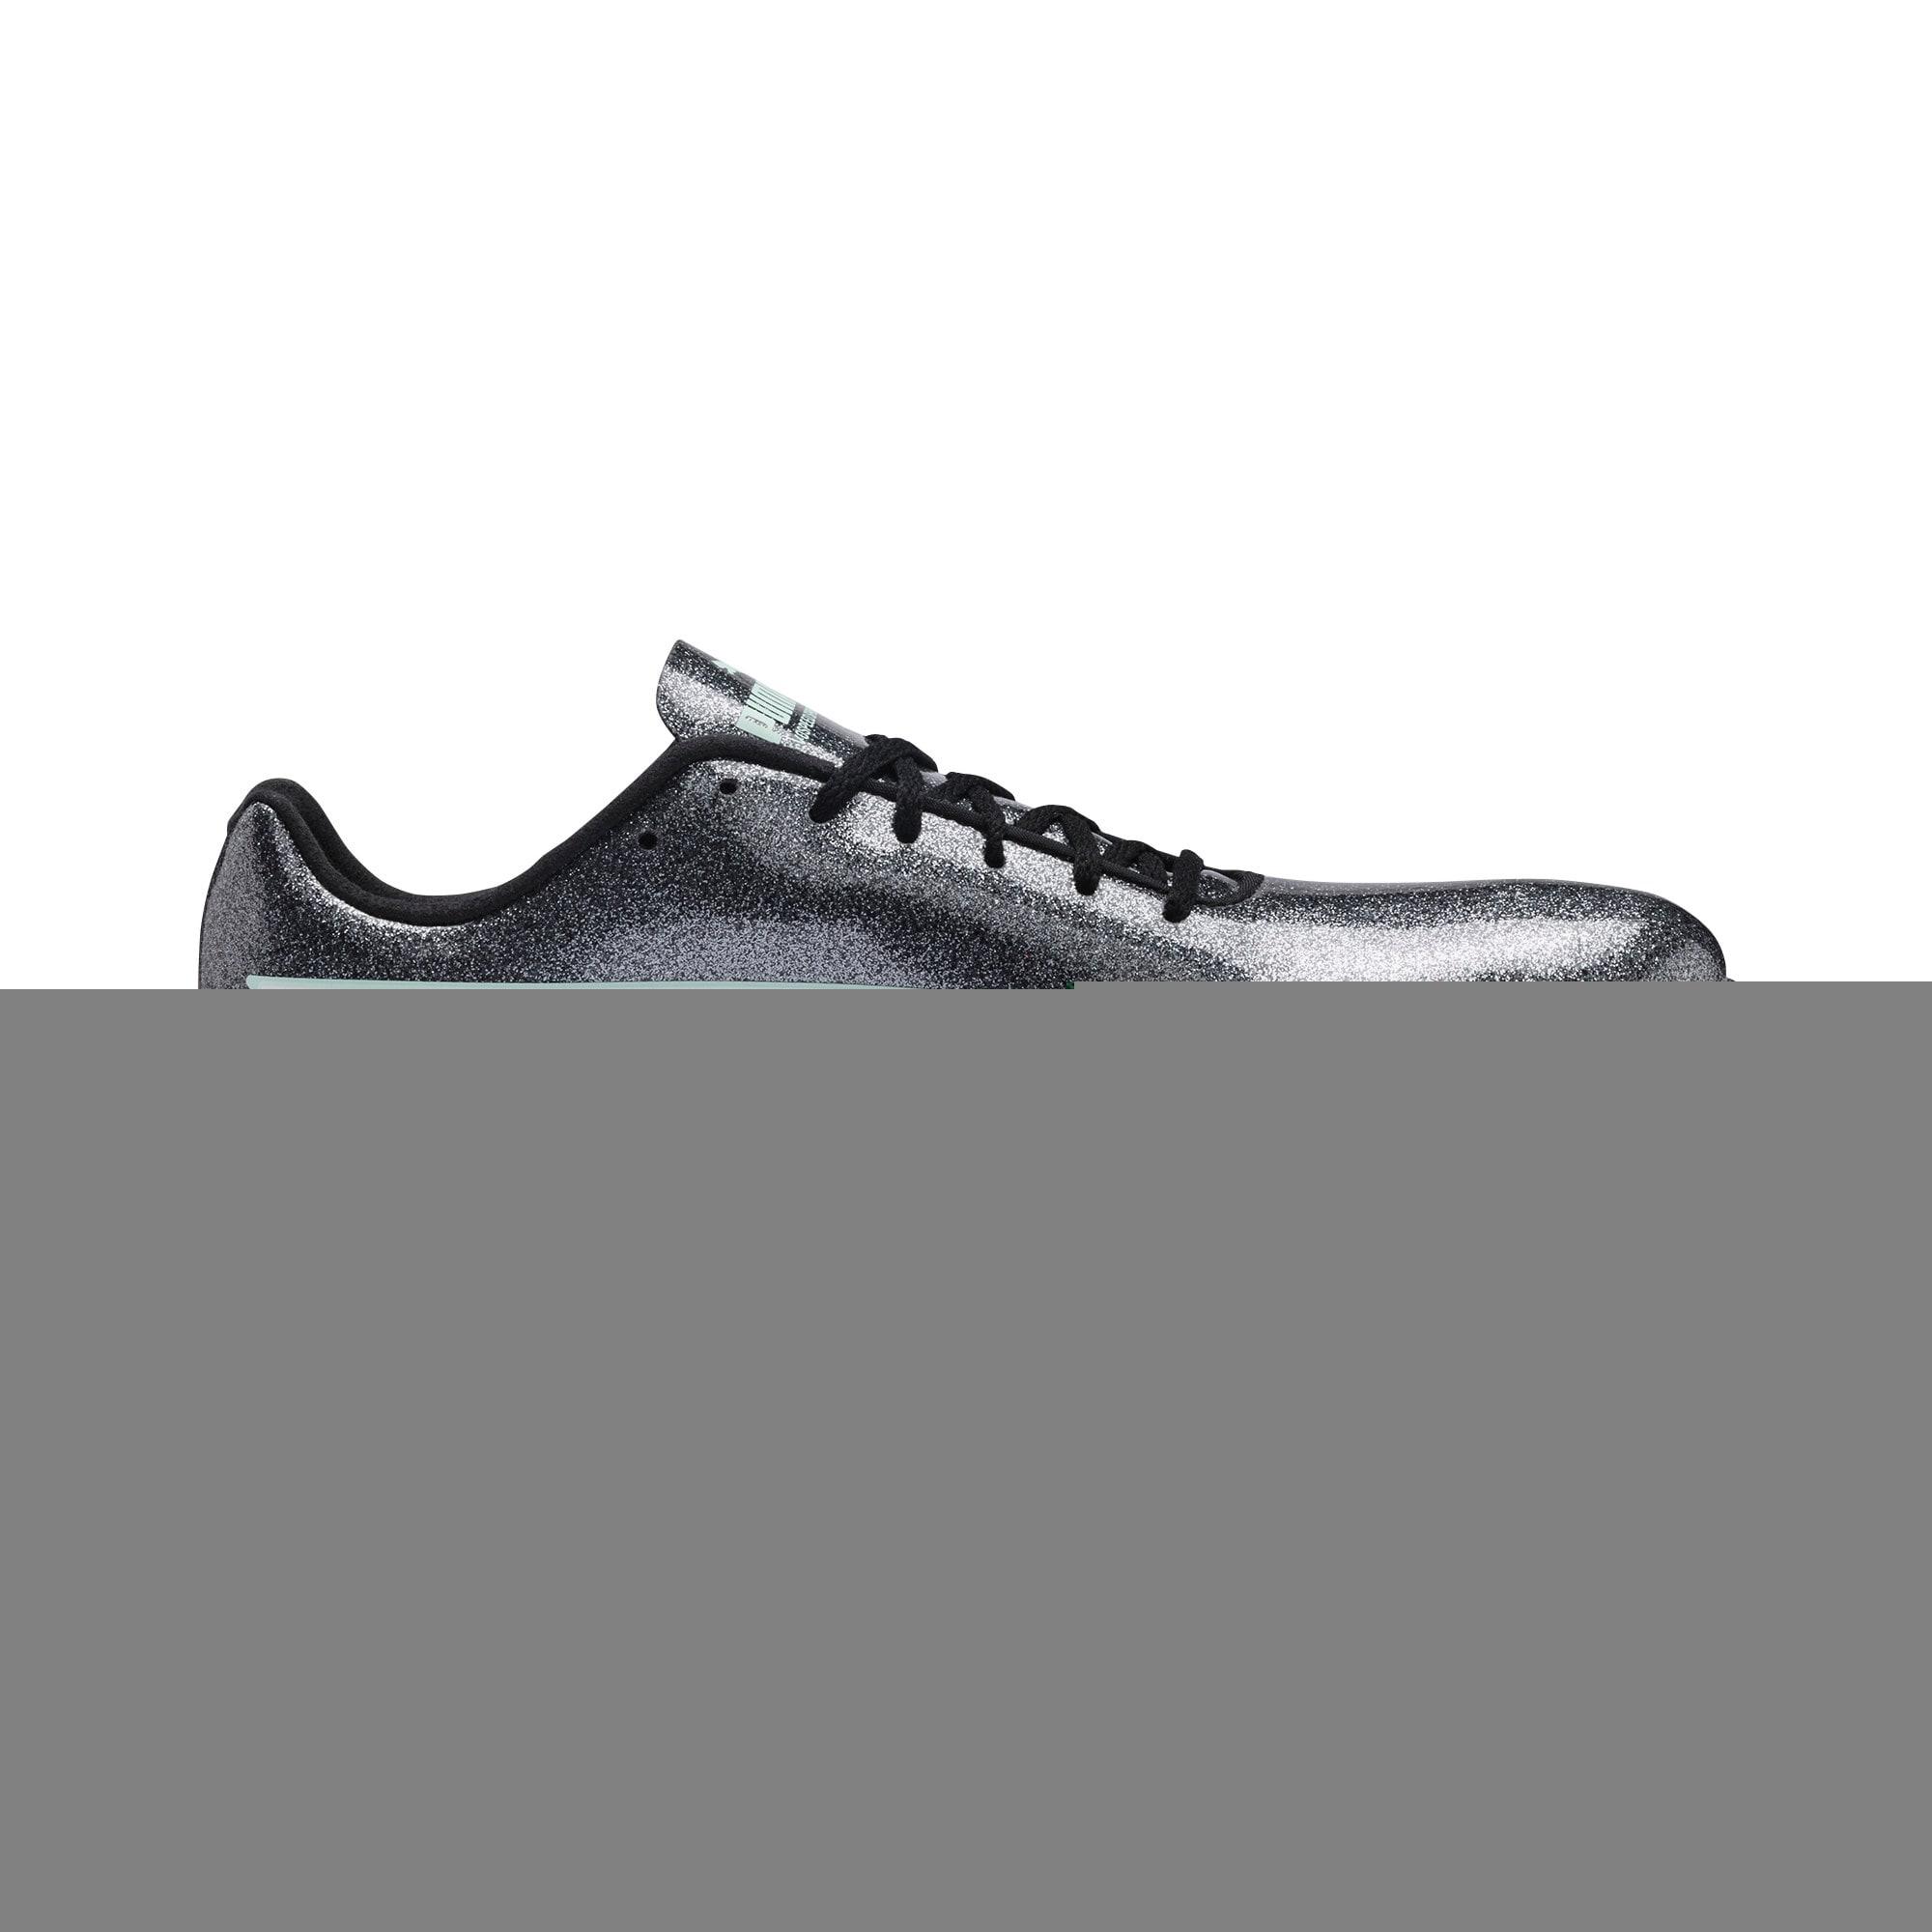 Thumbnail 5 of evoSPEED Sprint 9 Women's Track Spikes, Steel Gray-Fair Aqua-White, medium